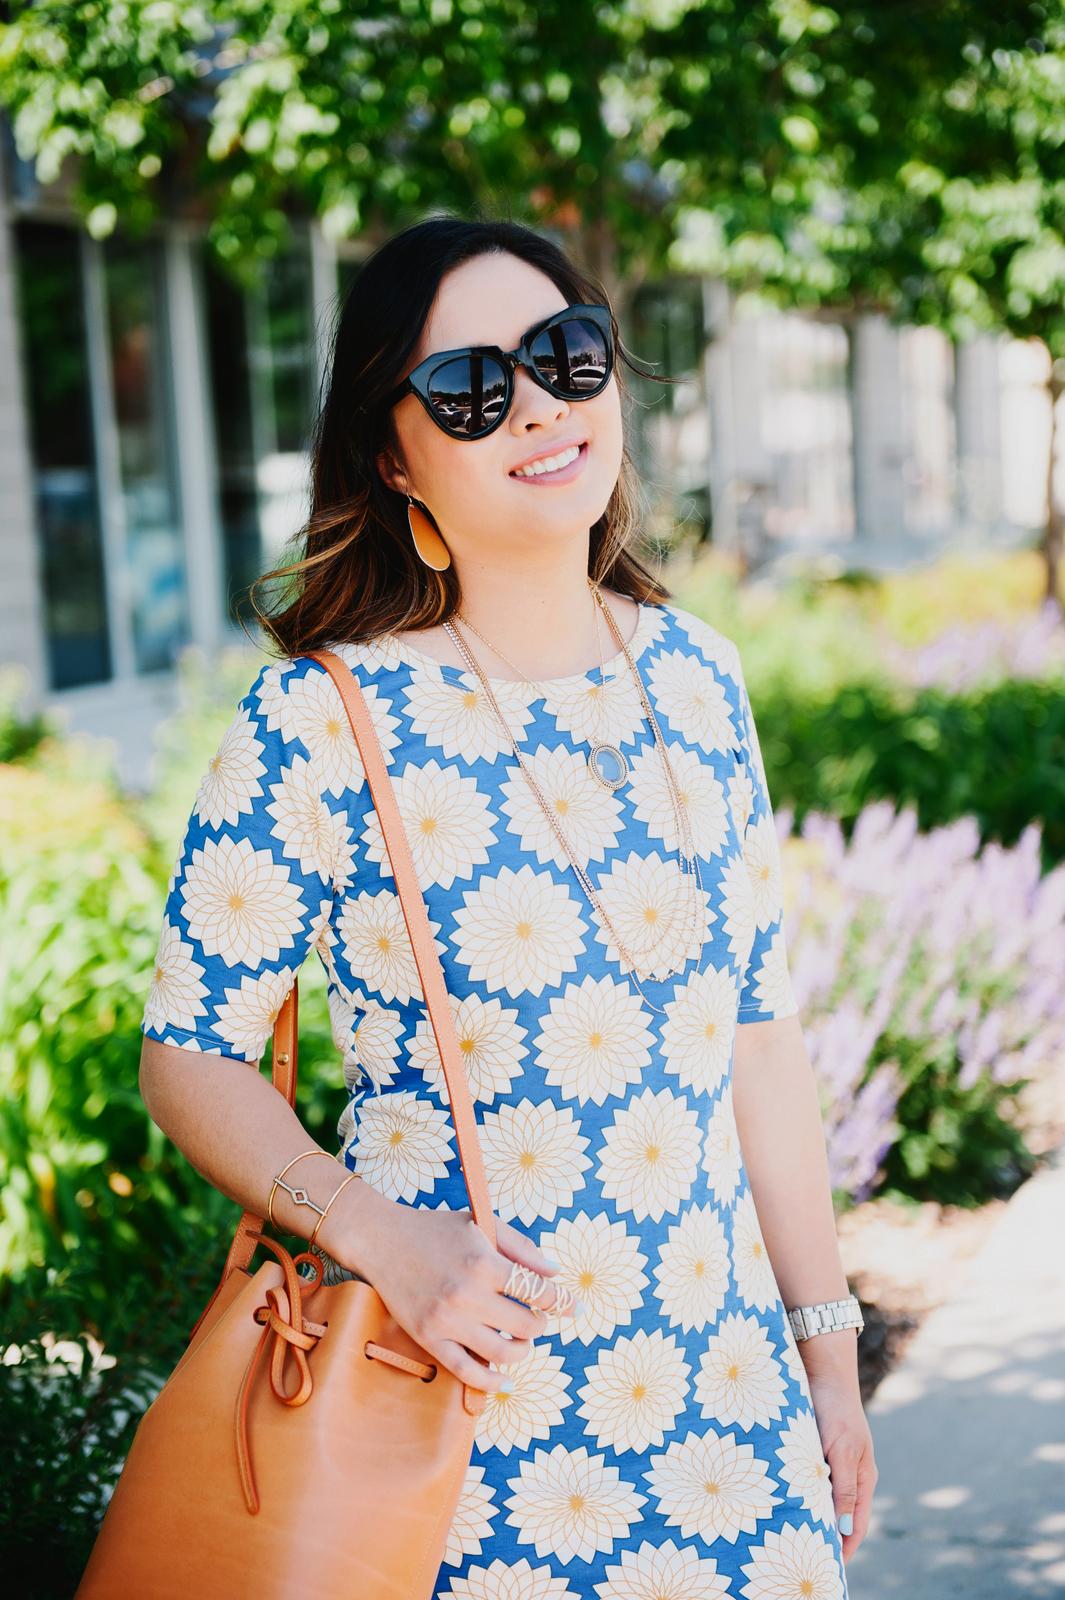 Sandy a la Mode | Fashion Blogger wearing The Avarca Store sandals